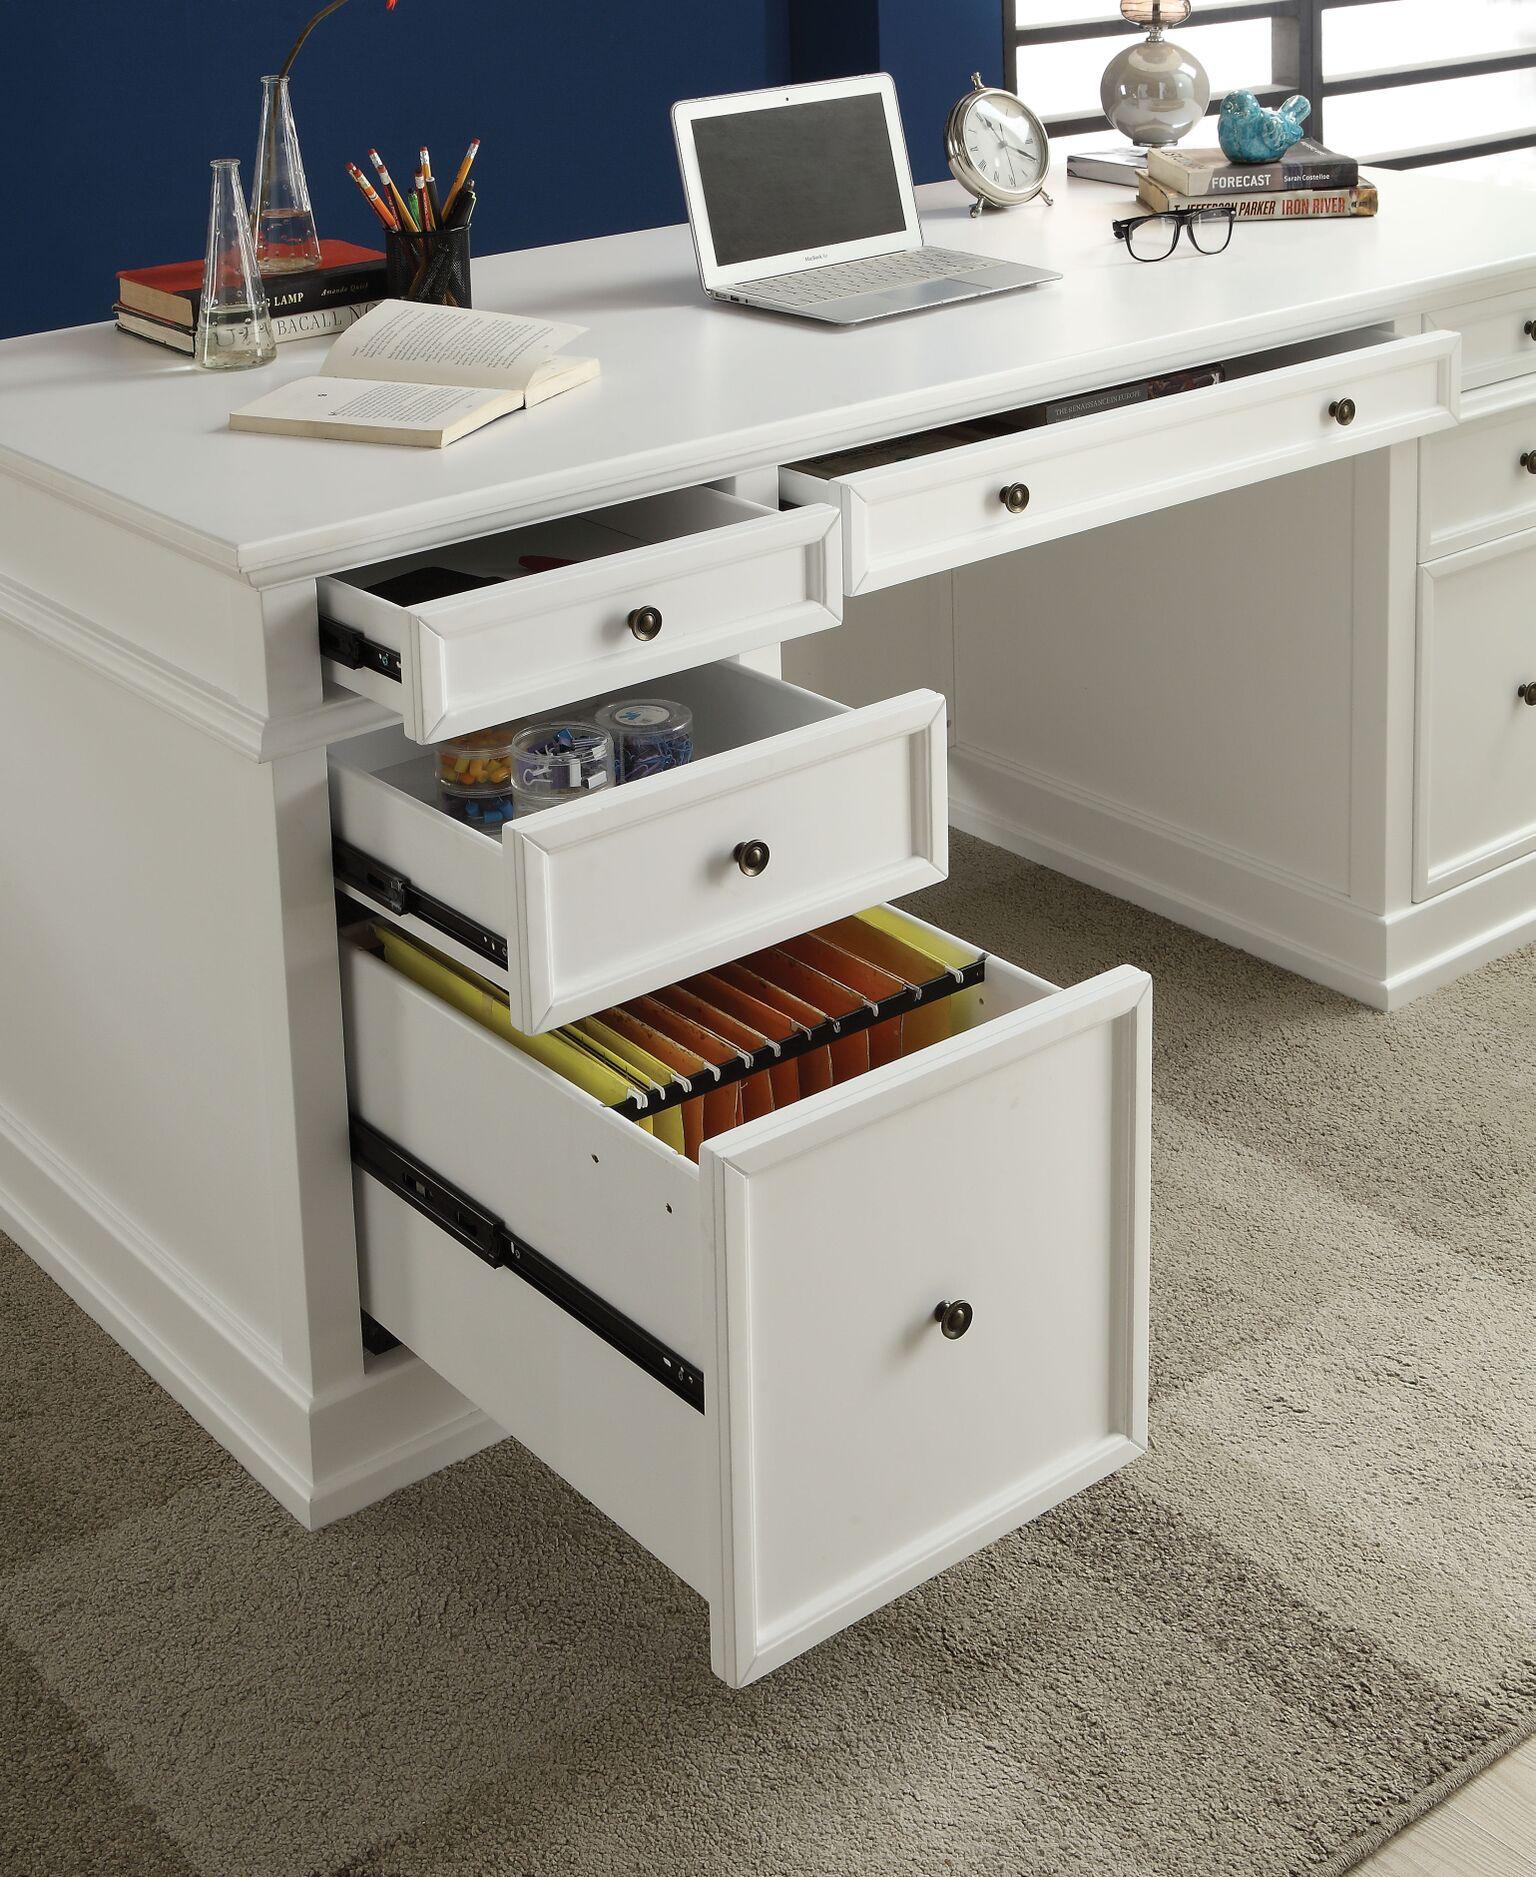 Daiki Desk White Wooden Desk With Drawers File Cabinet Casa